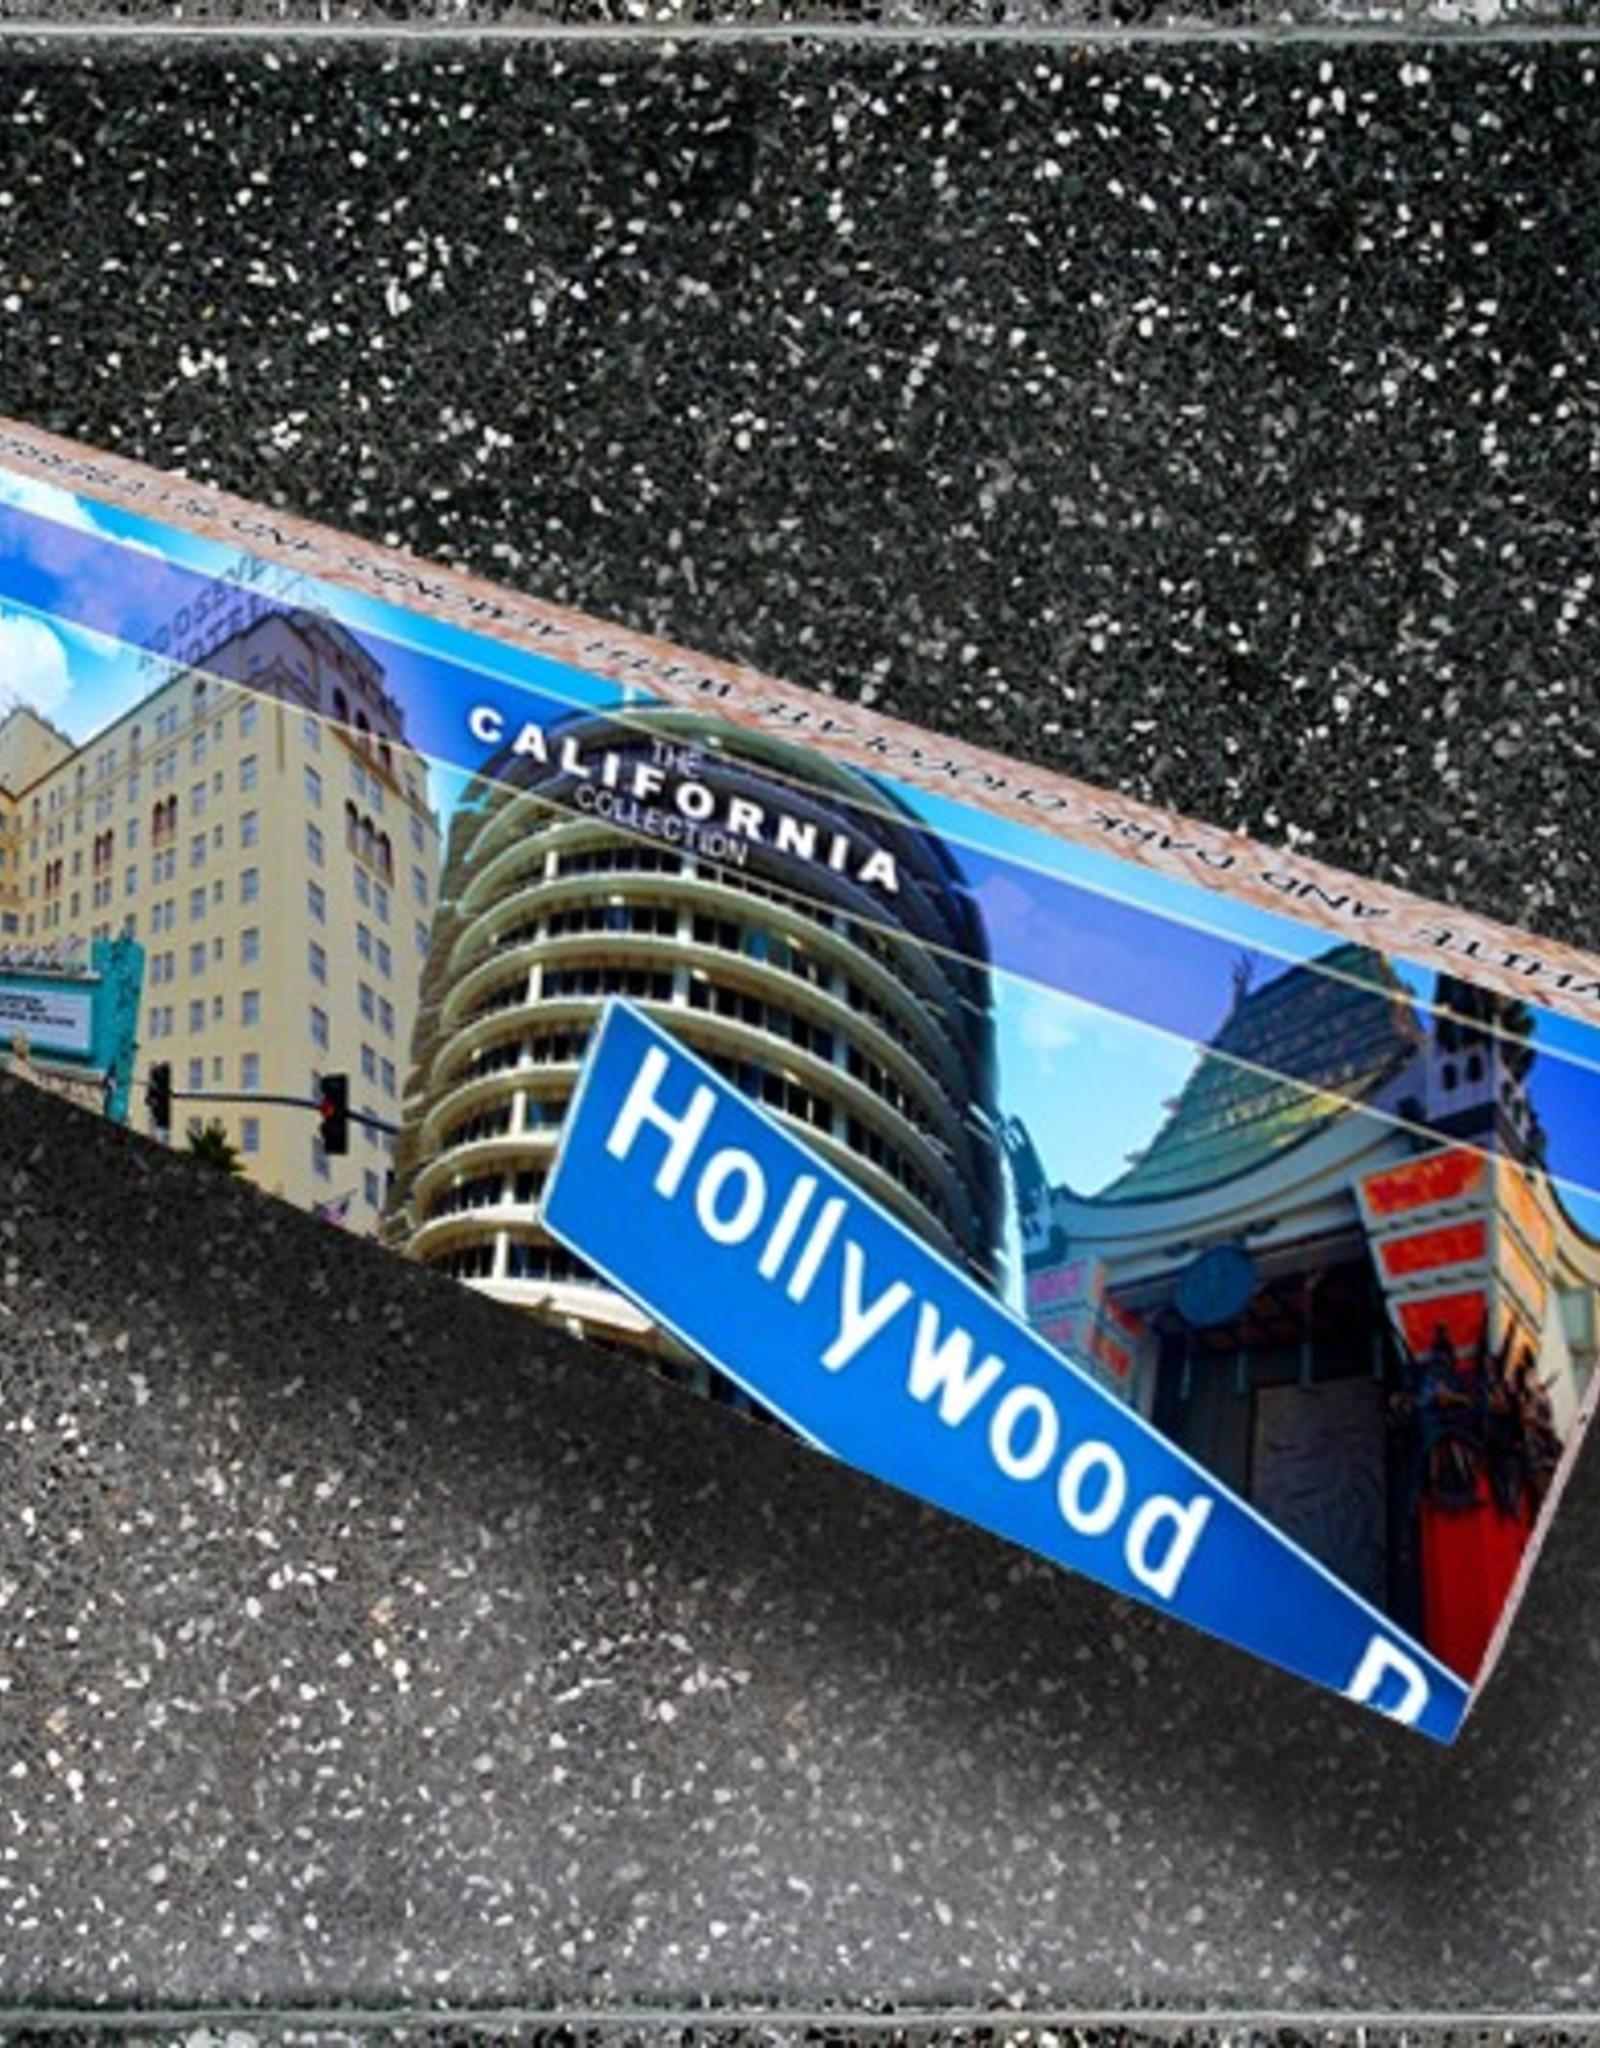 The California Bar Collection: Hollywood